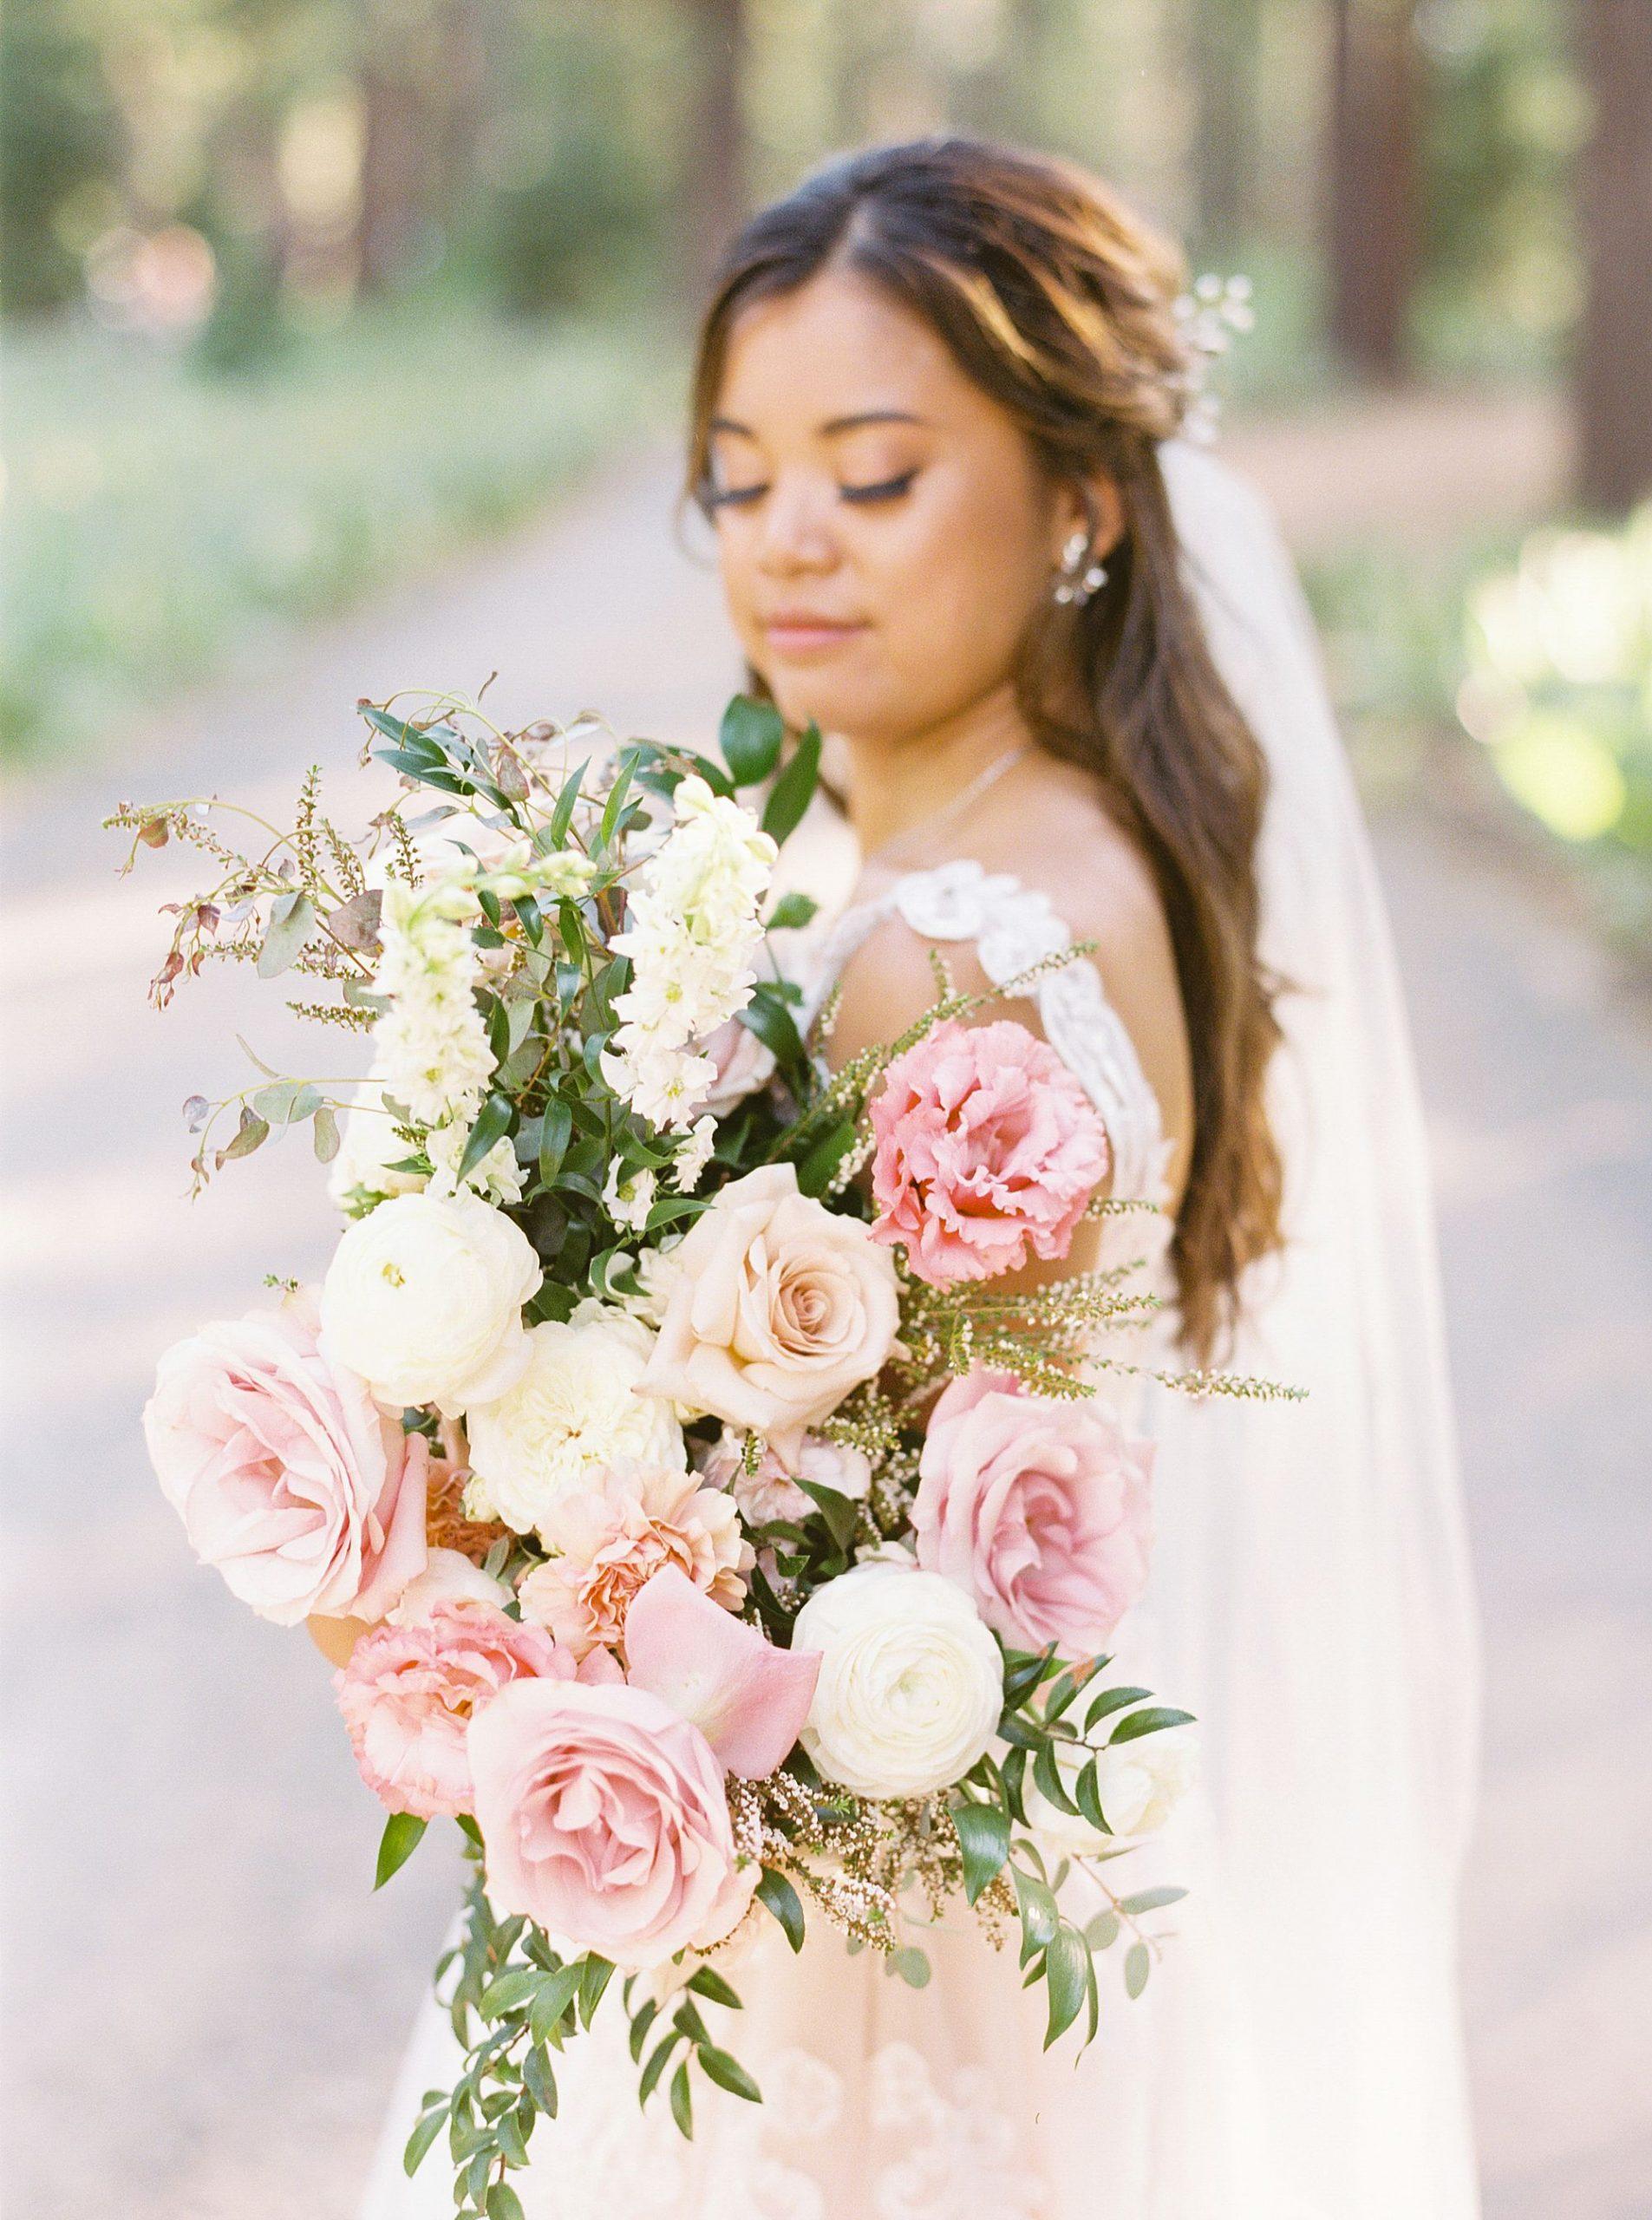 MITCHELLS MOUNTAIN MEADOWS Wedding - Ash Baumgartner - Phallina and Matt - Sierraville Wedding - Tahoe Wedding Photography_0019.jpg